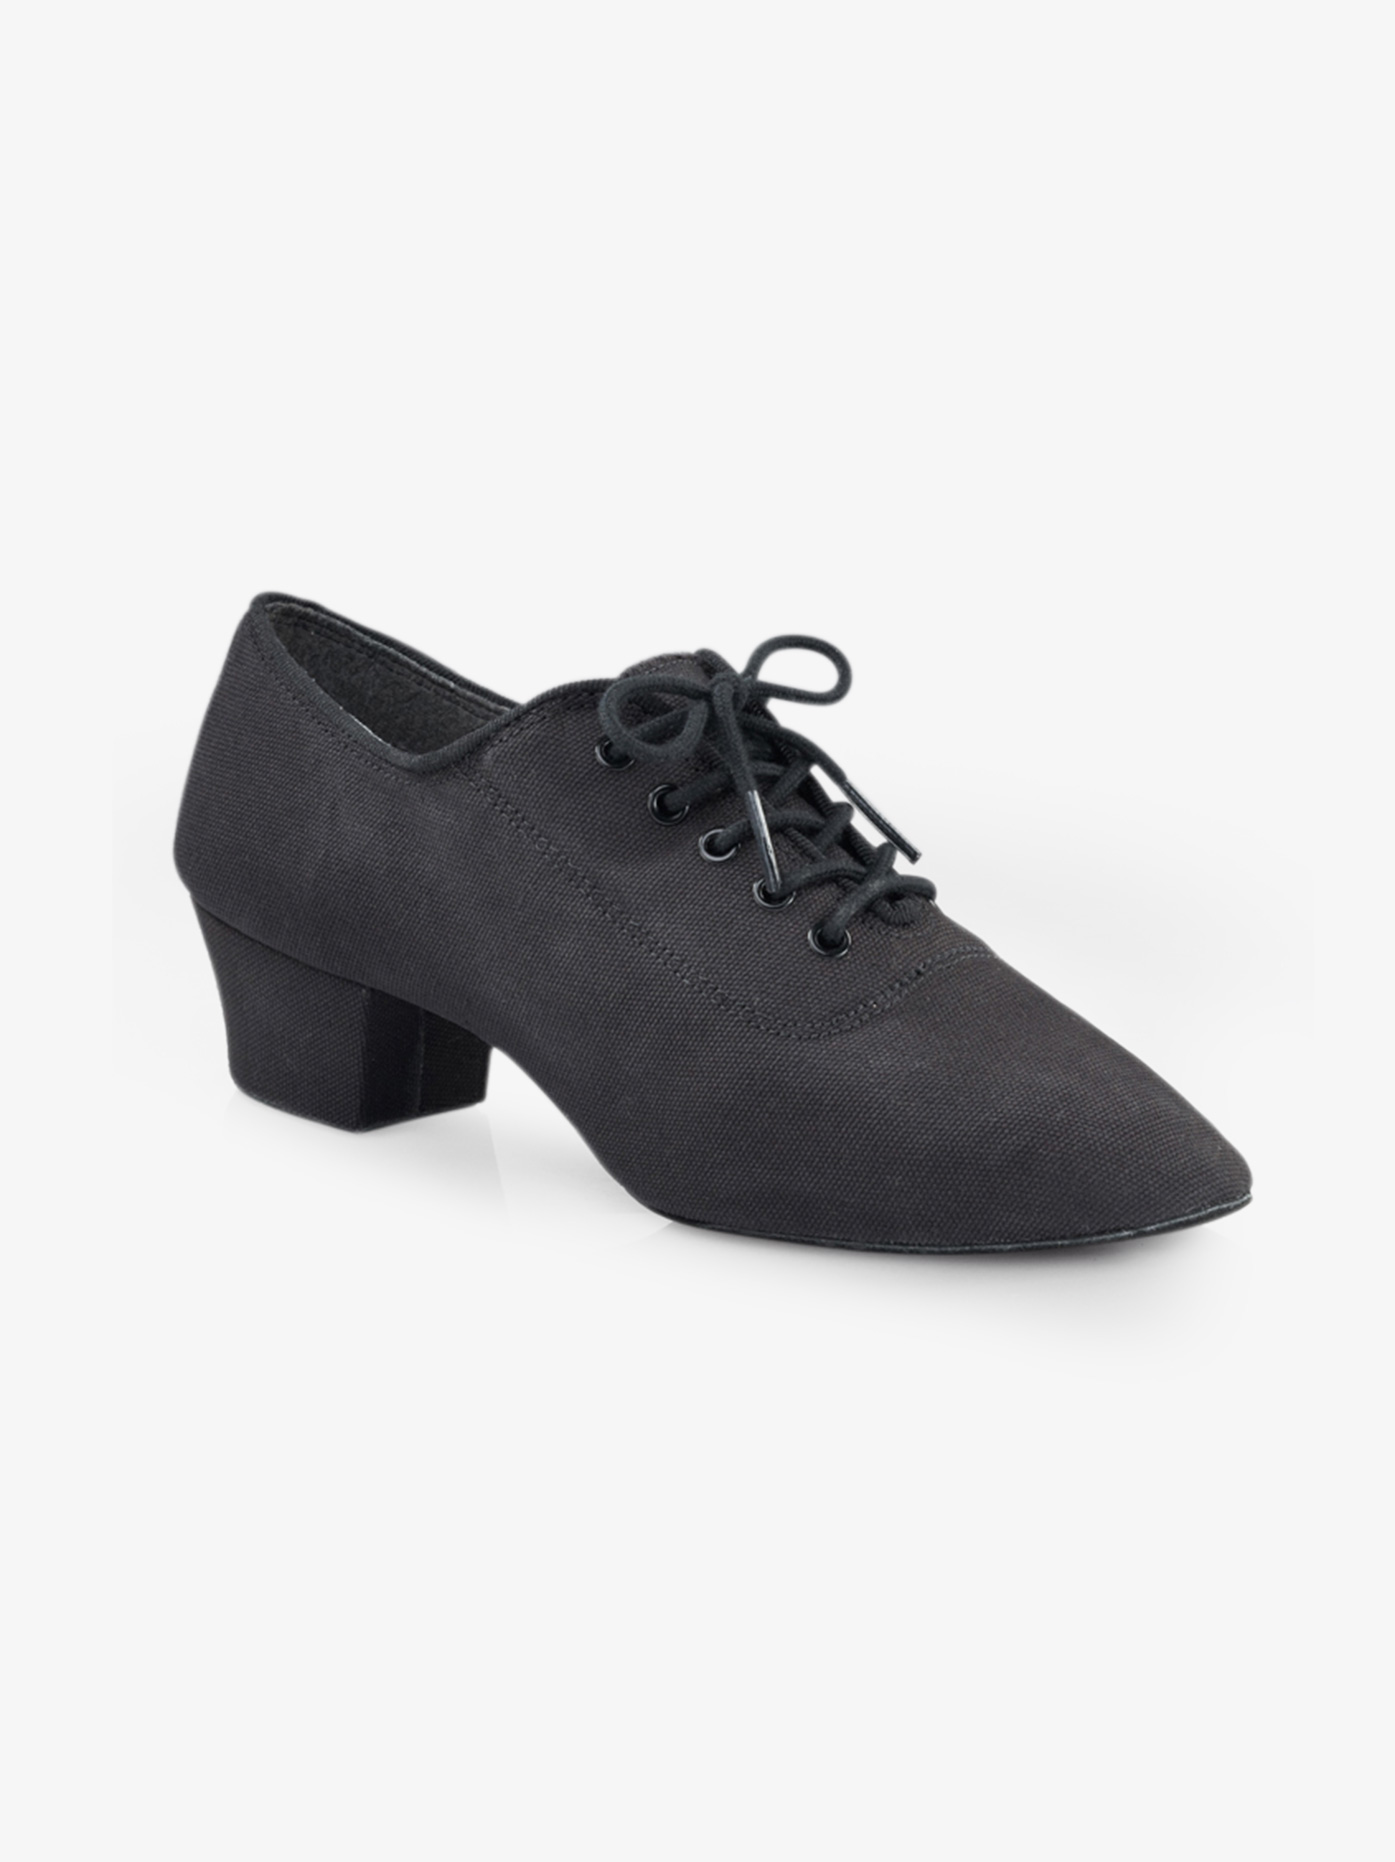 Capezio Adult Unisex 1.25 Practice Ballroom Shoes BR74